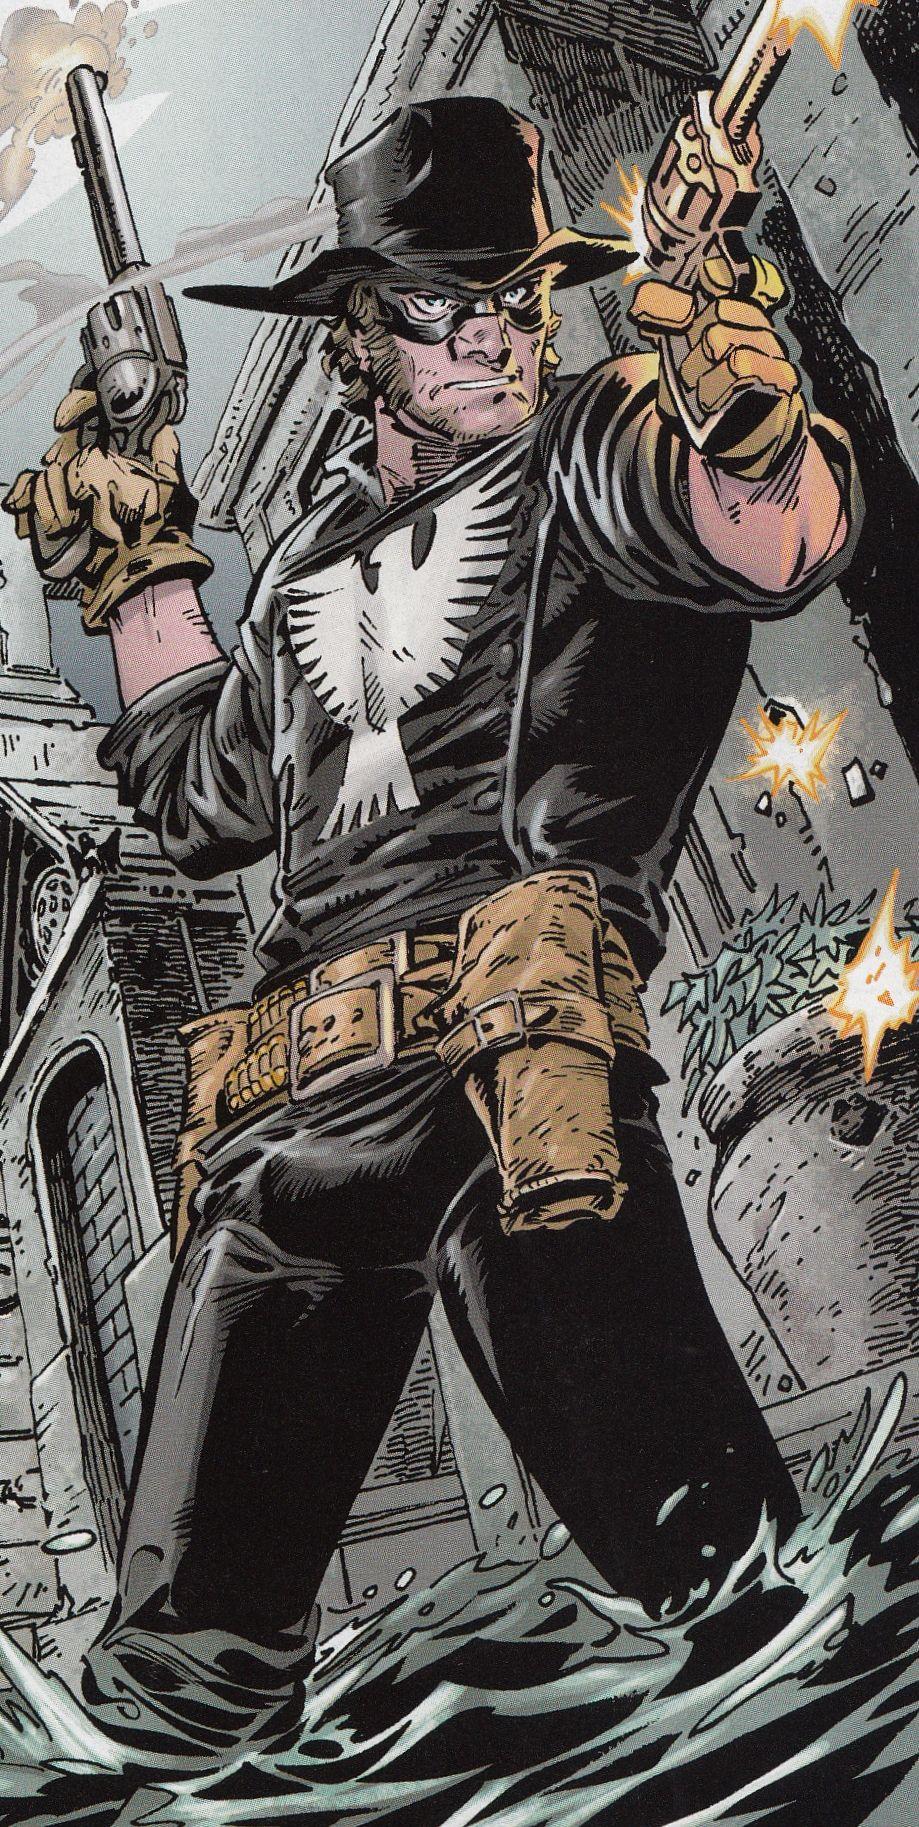 [Year of Evil] Hawkman Rises [LIBRE] - Page 2 96cfd140bc5af296b095b9bb6c36dae6